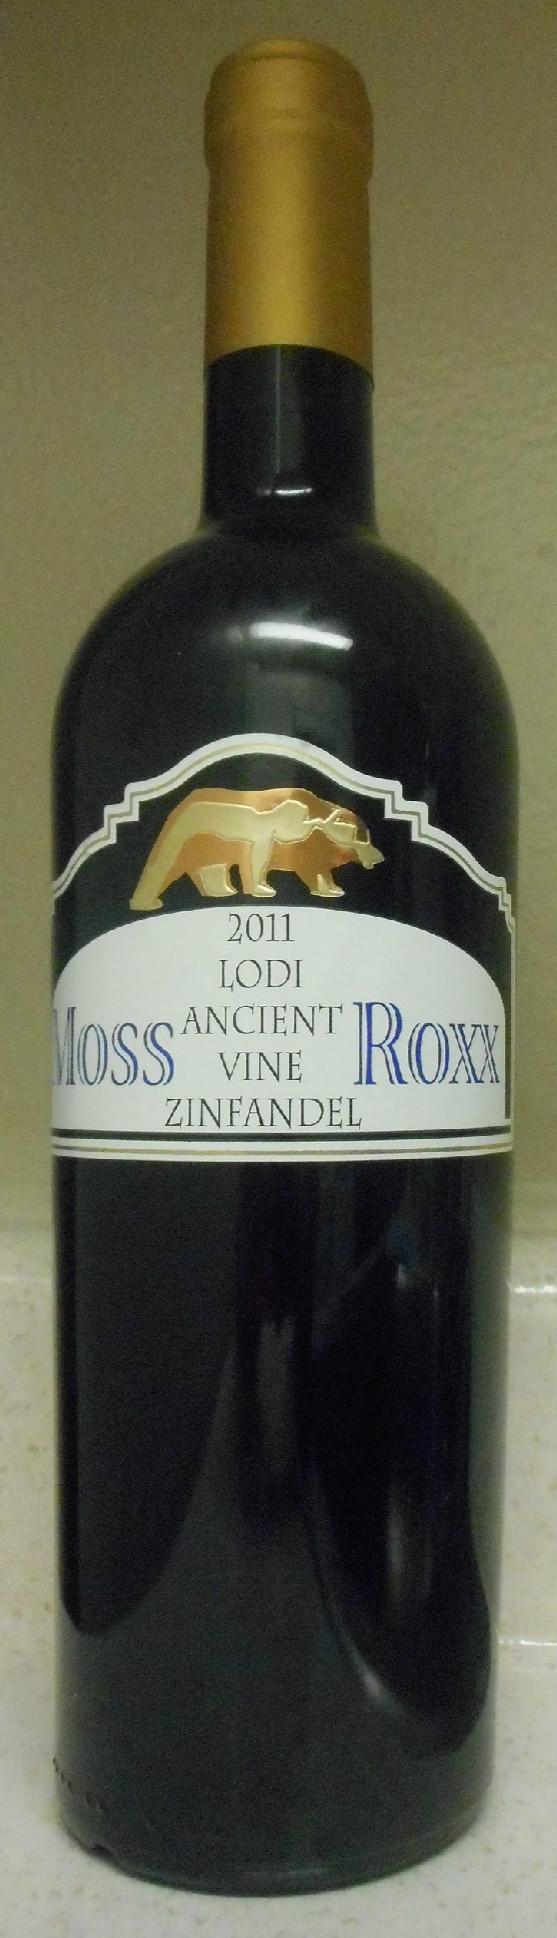 2011-moss-roxx-zinfandel